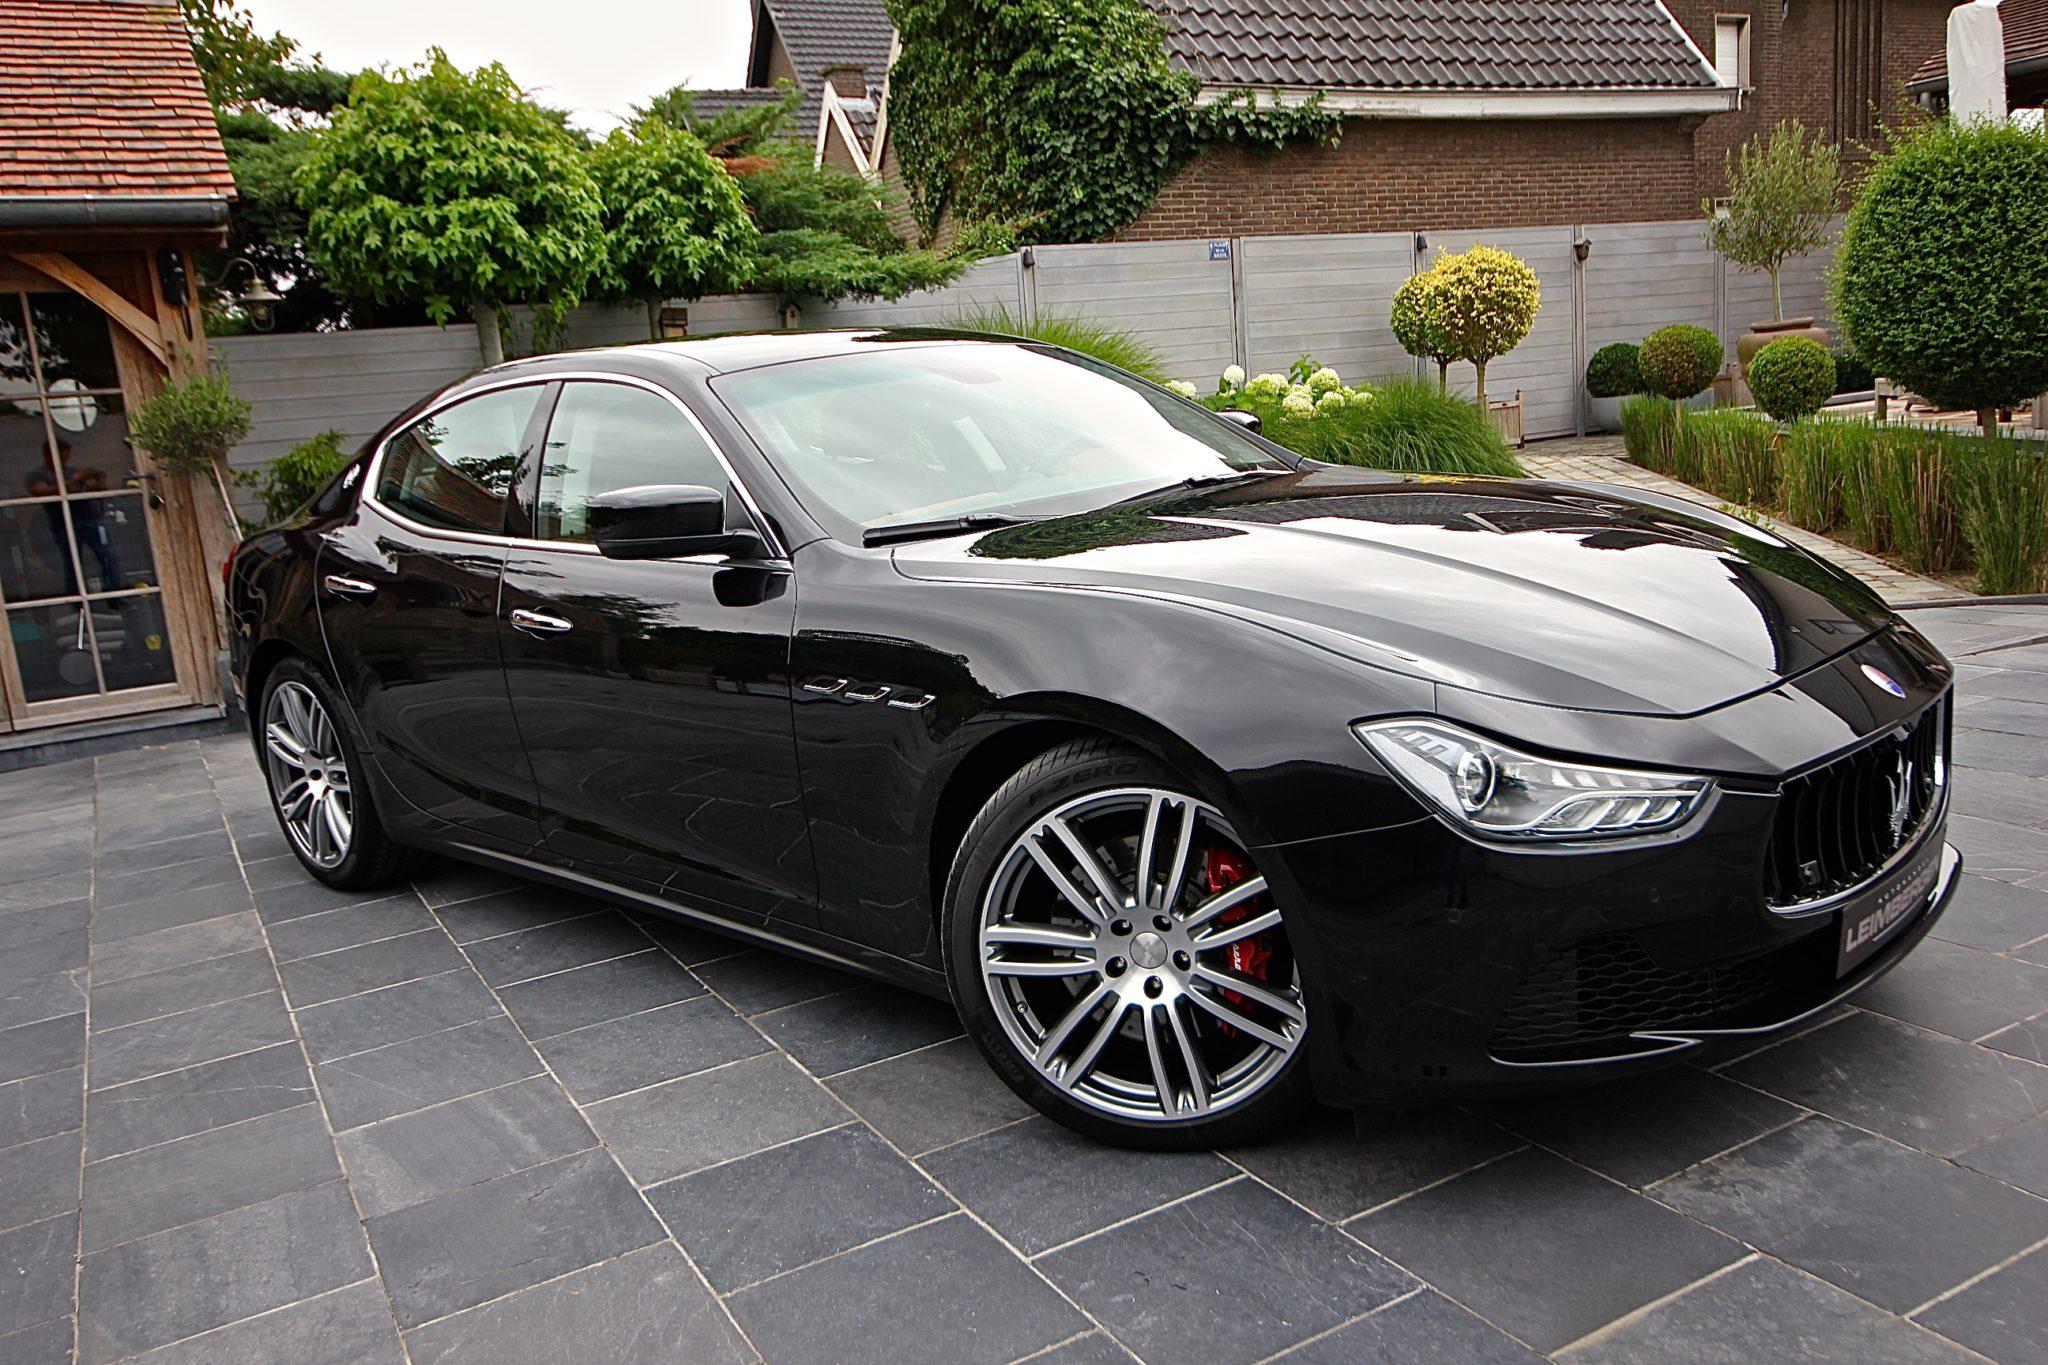 Maserati Ghibli 3.0 V6 Diesel - Autohandel Leimbergen